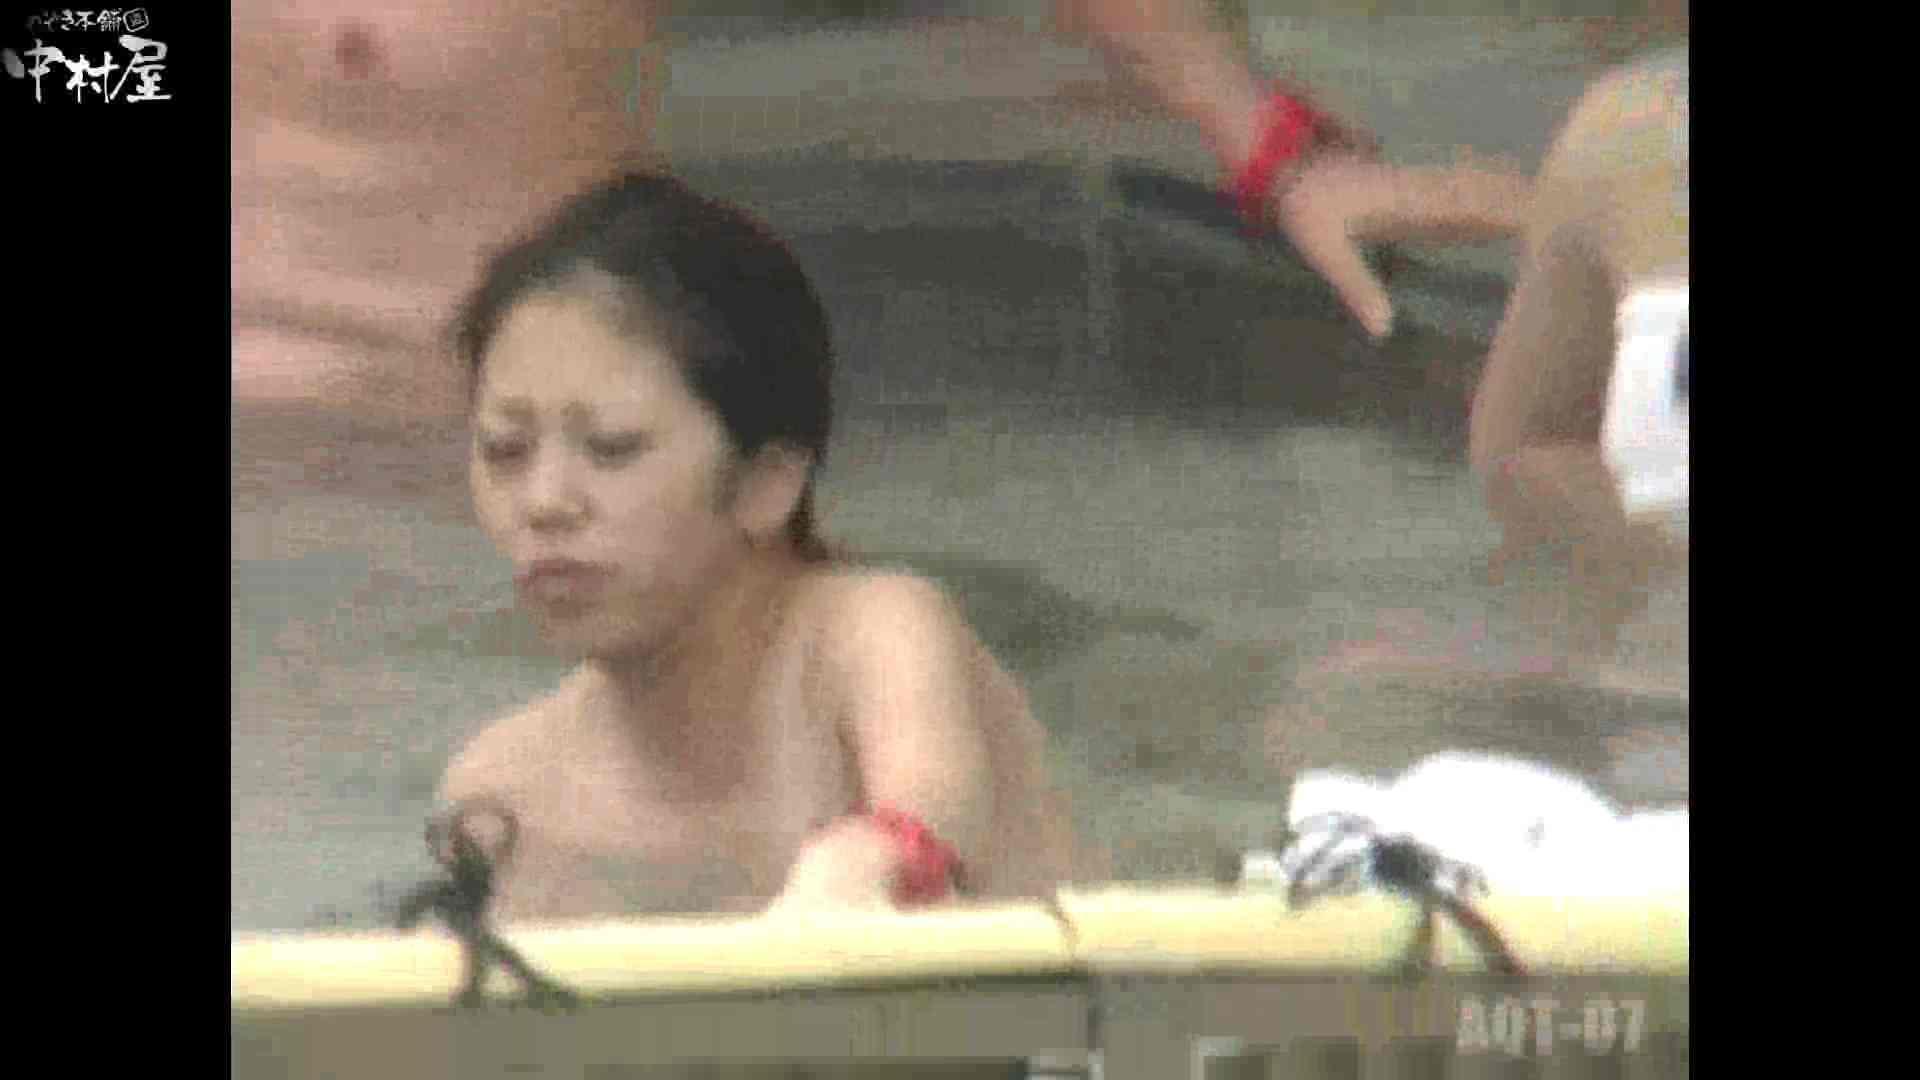 Aquaな露天風呂Vol.871潜入盗撮露天風呂七判湯 其の一 ガールの盗撮 スケベ動画紹介 60枚